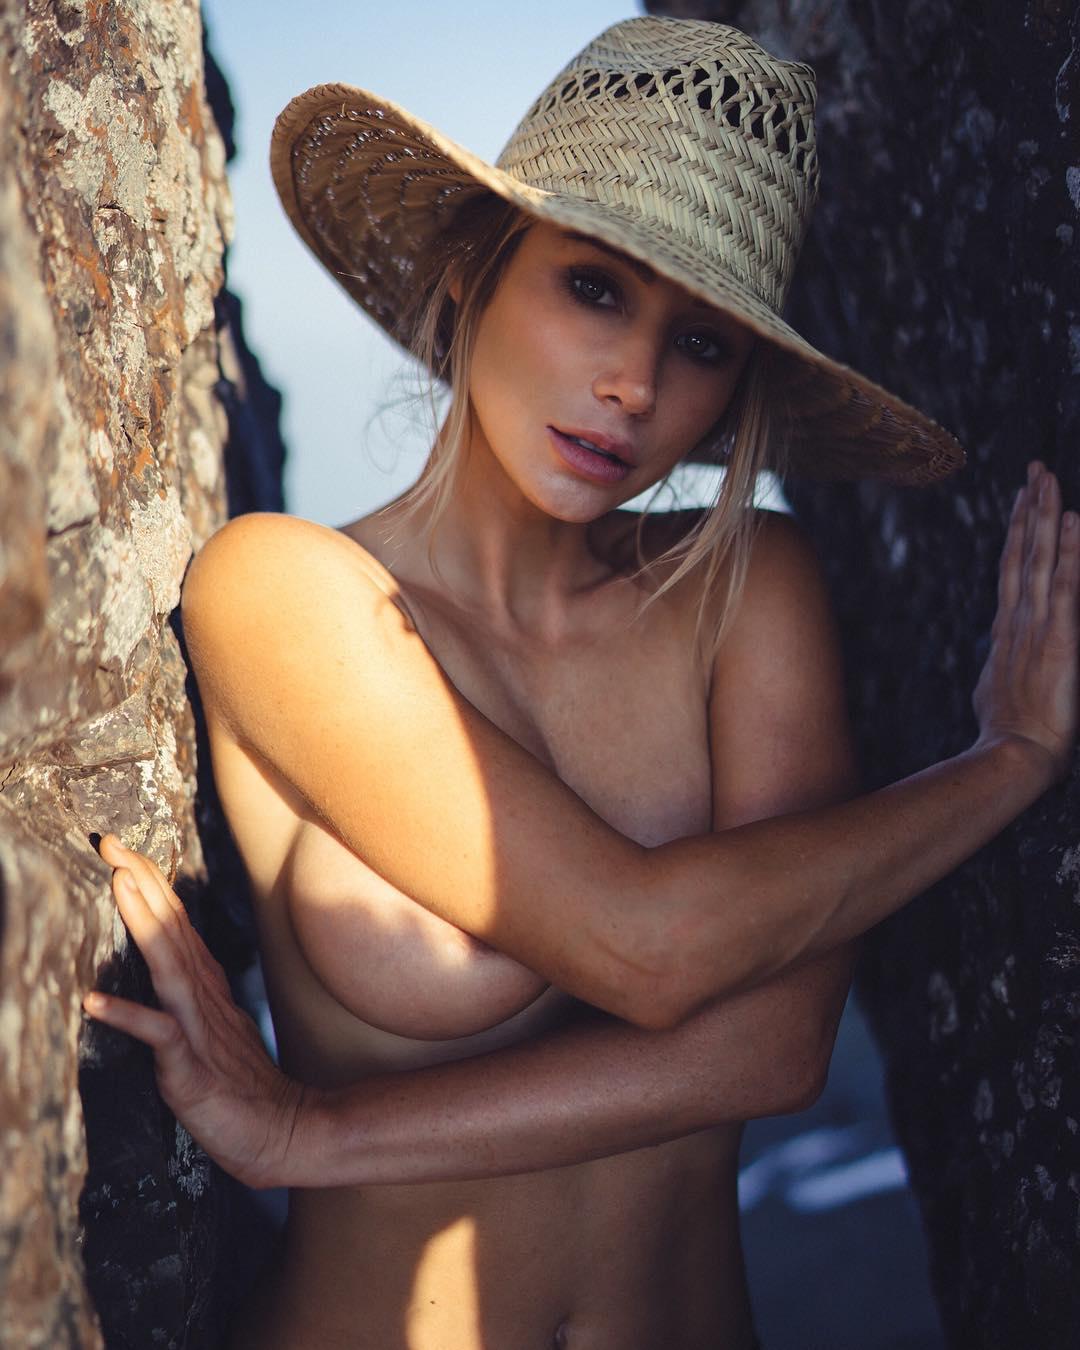 Images Ariel Winter naked (91 photo), Tits, Paparazzi, Selfie, lingerie 2015